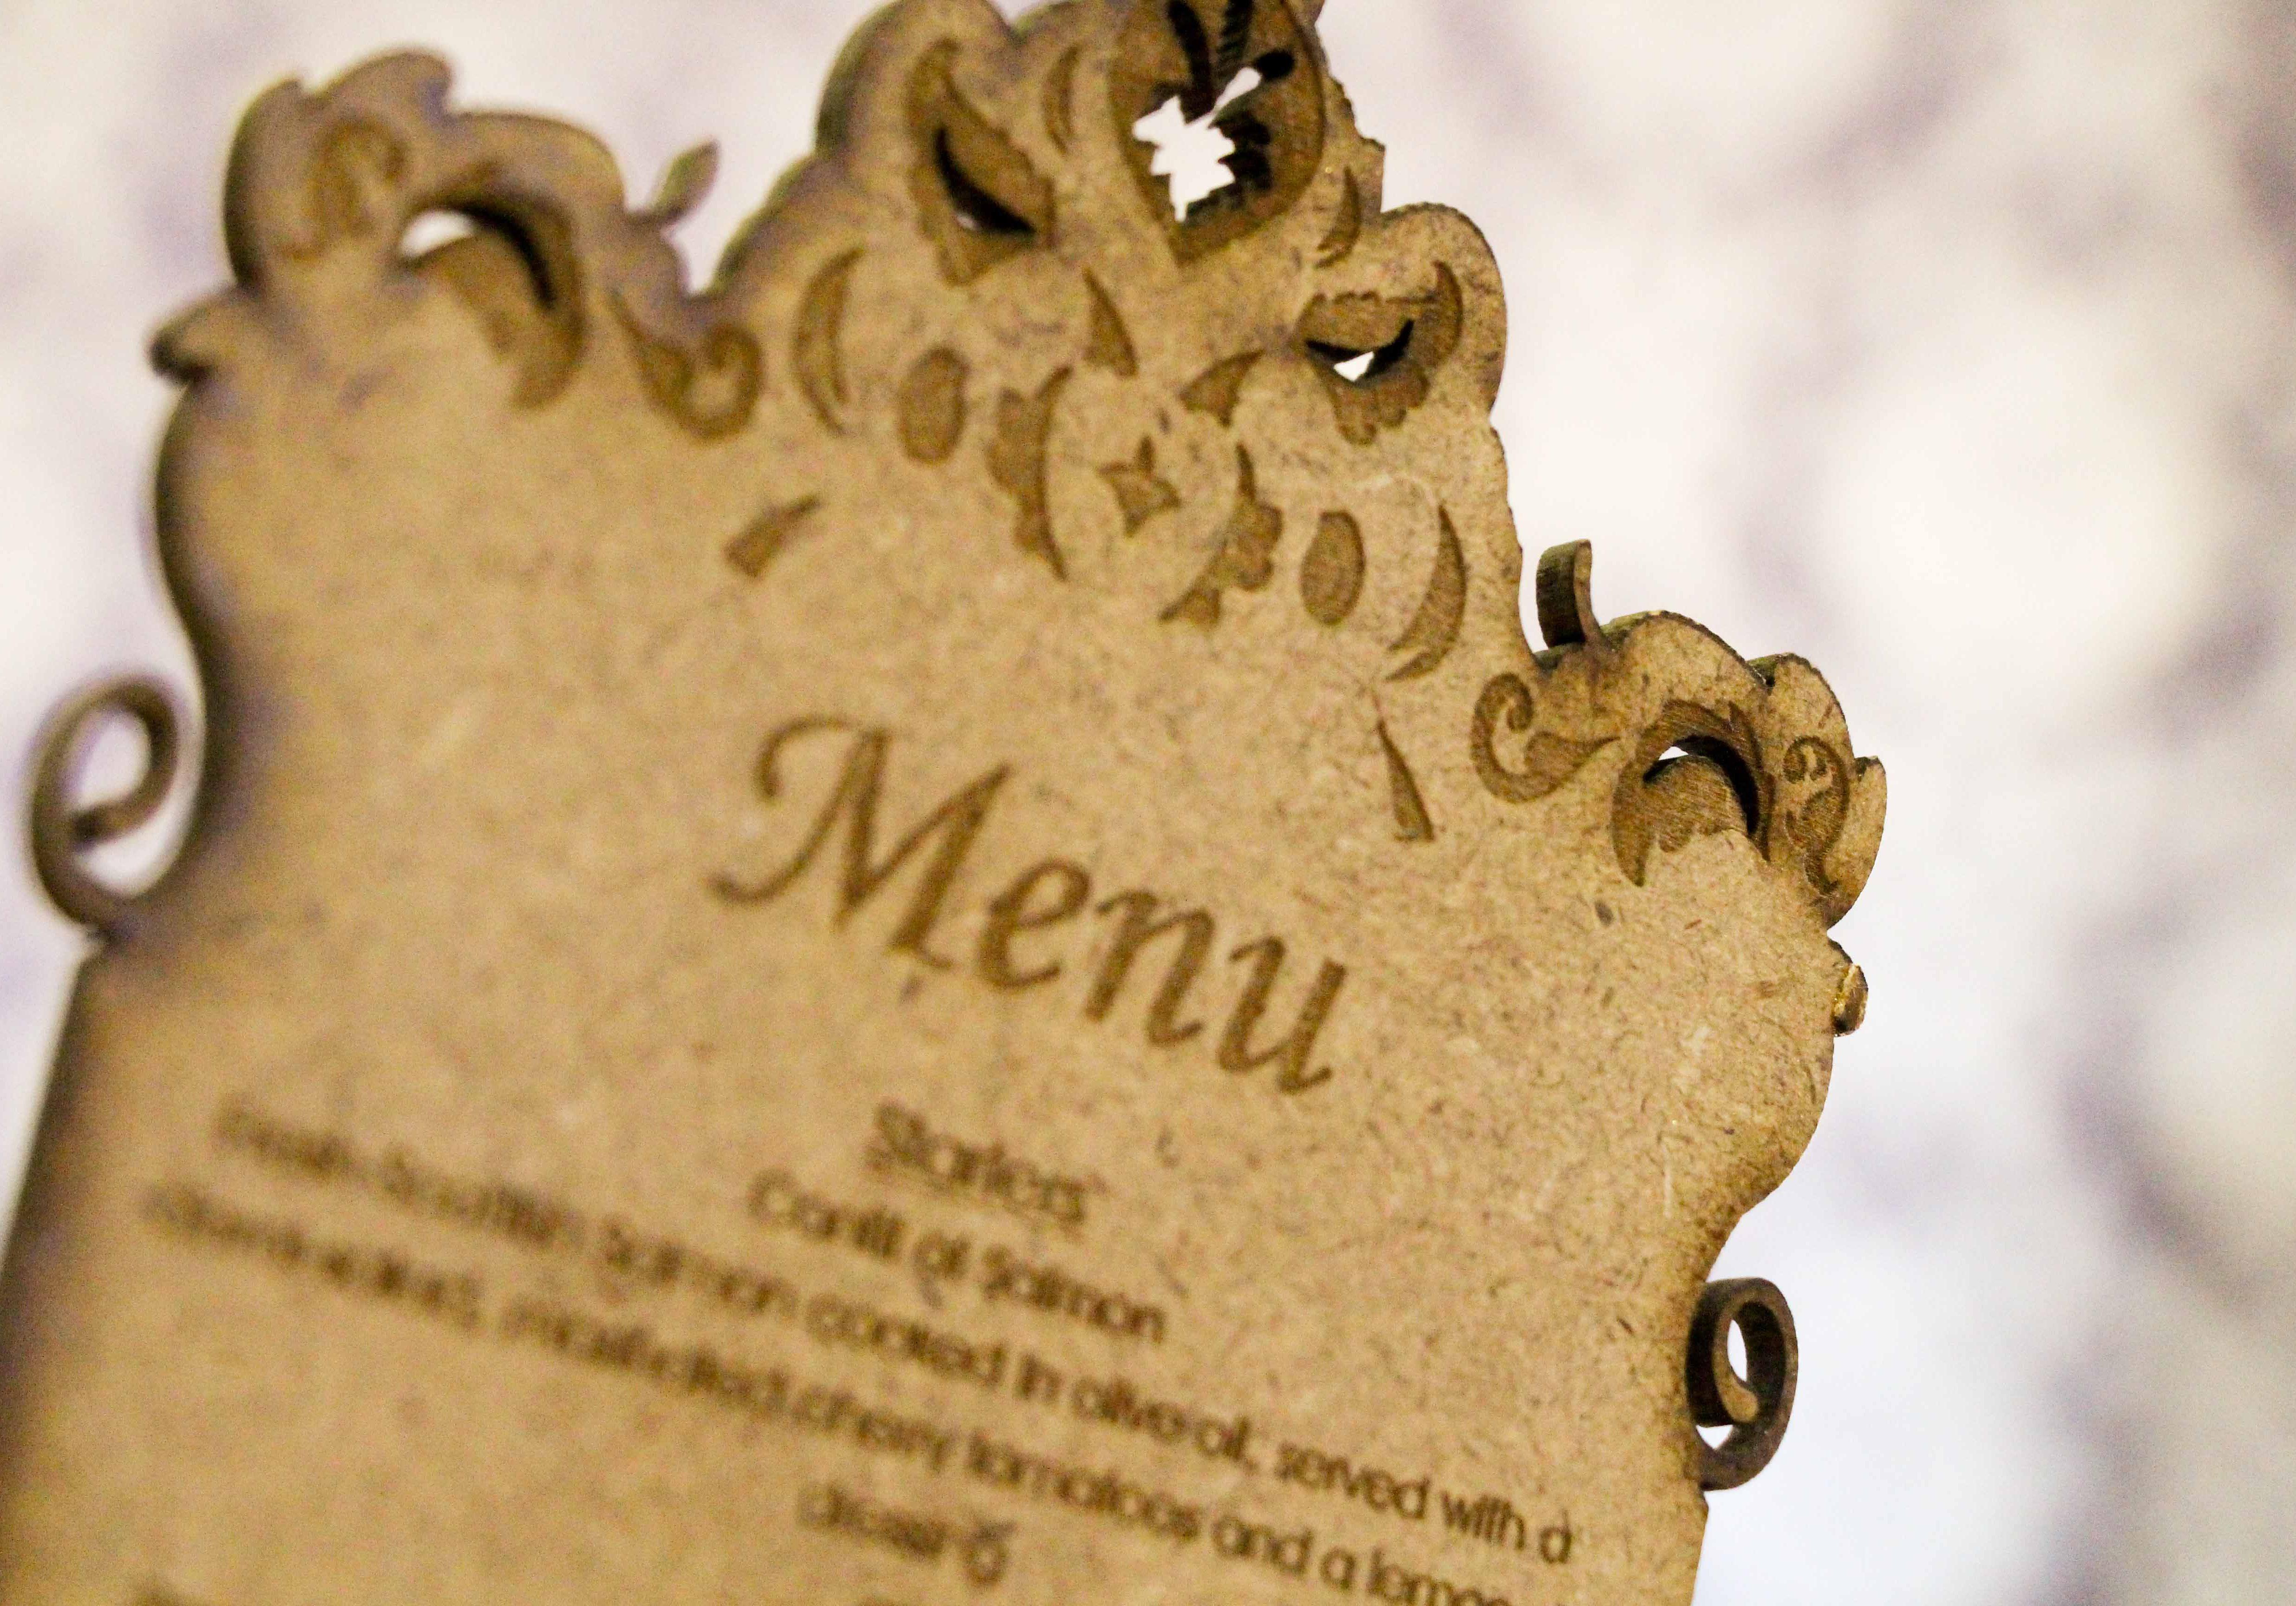 Laser engraved menus